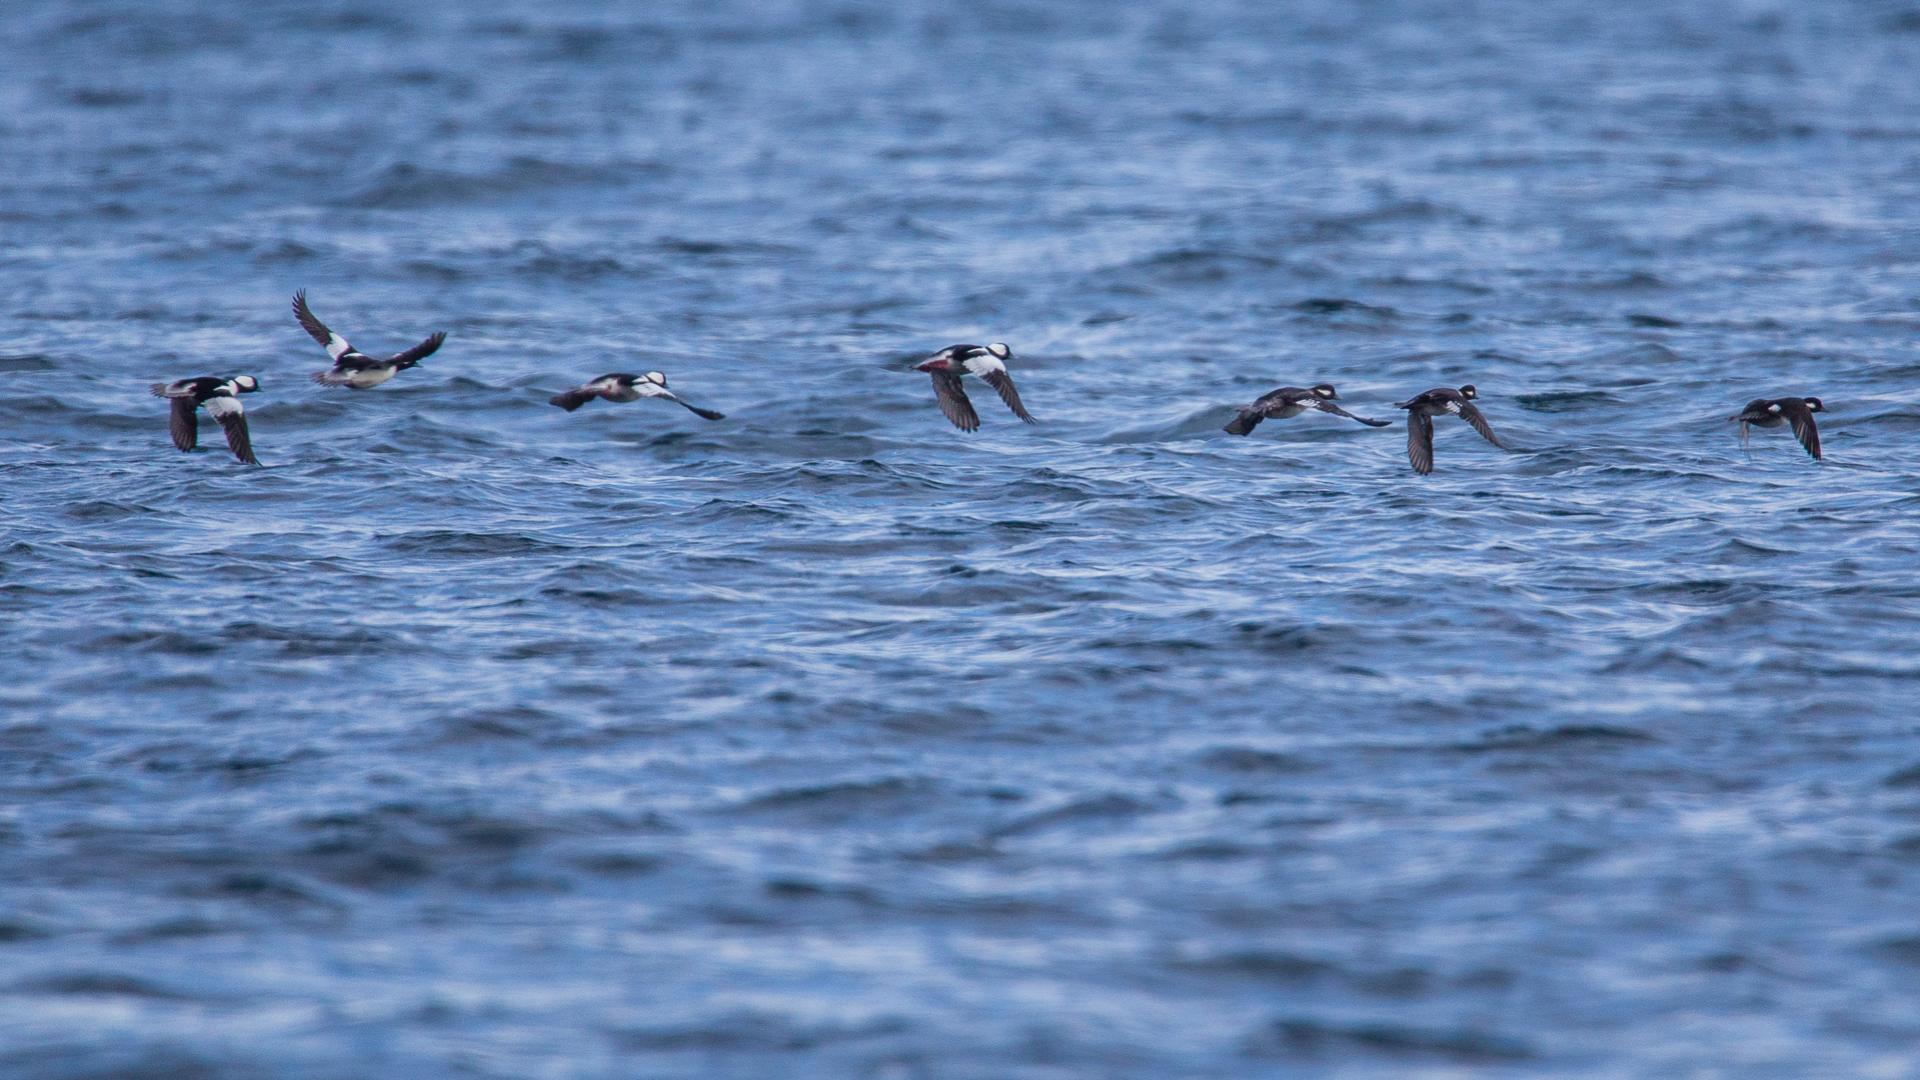 I little flock of buffleheads taking flight.